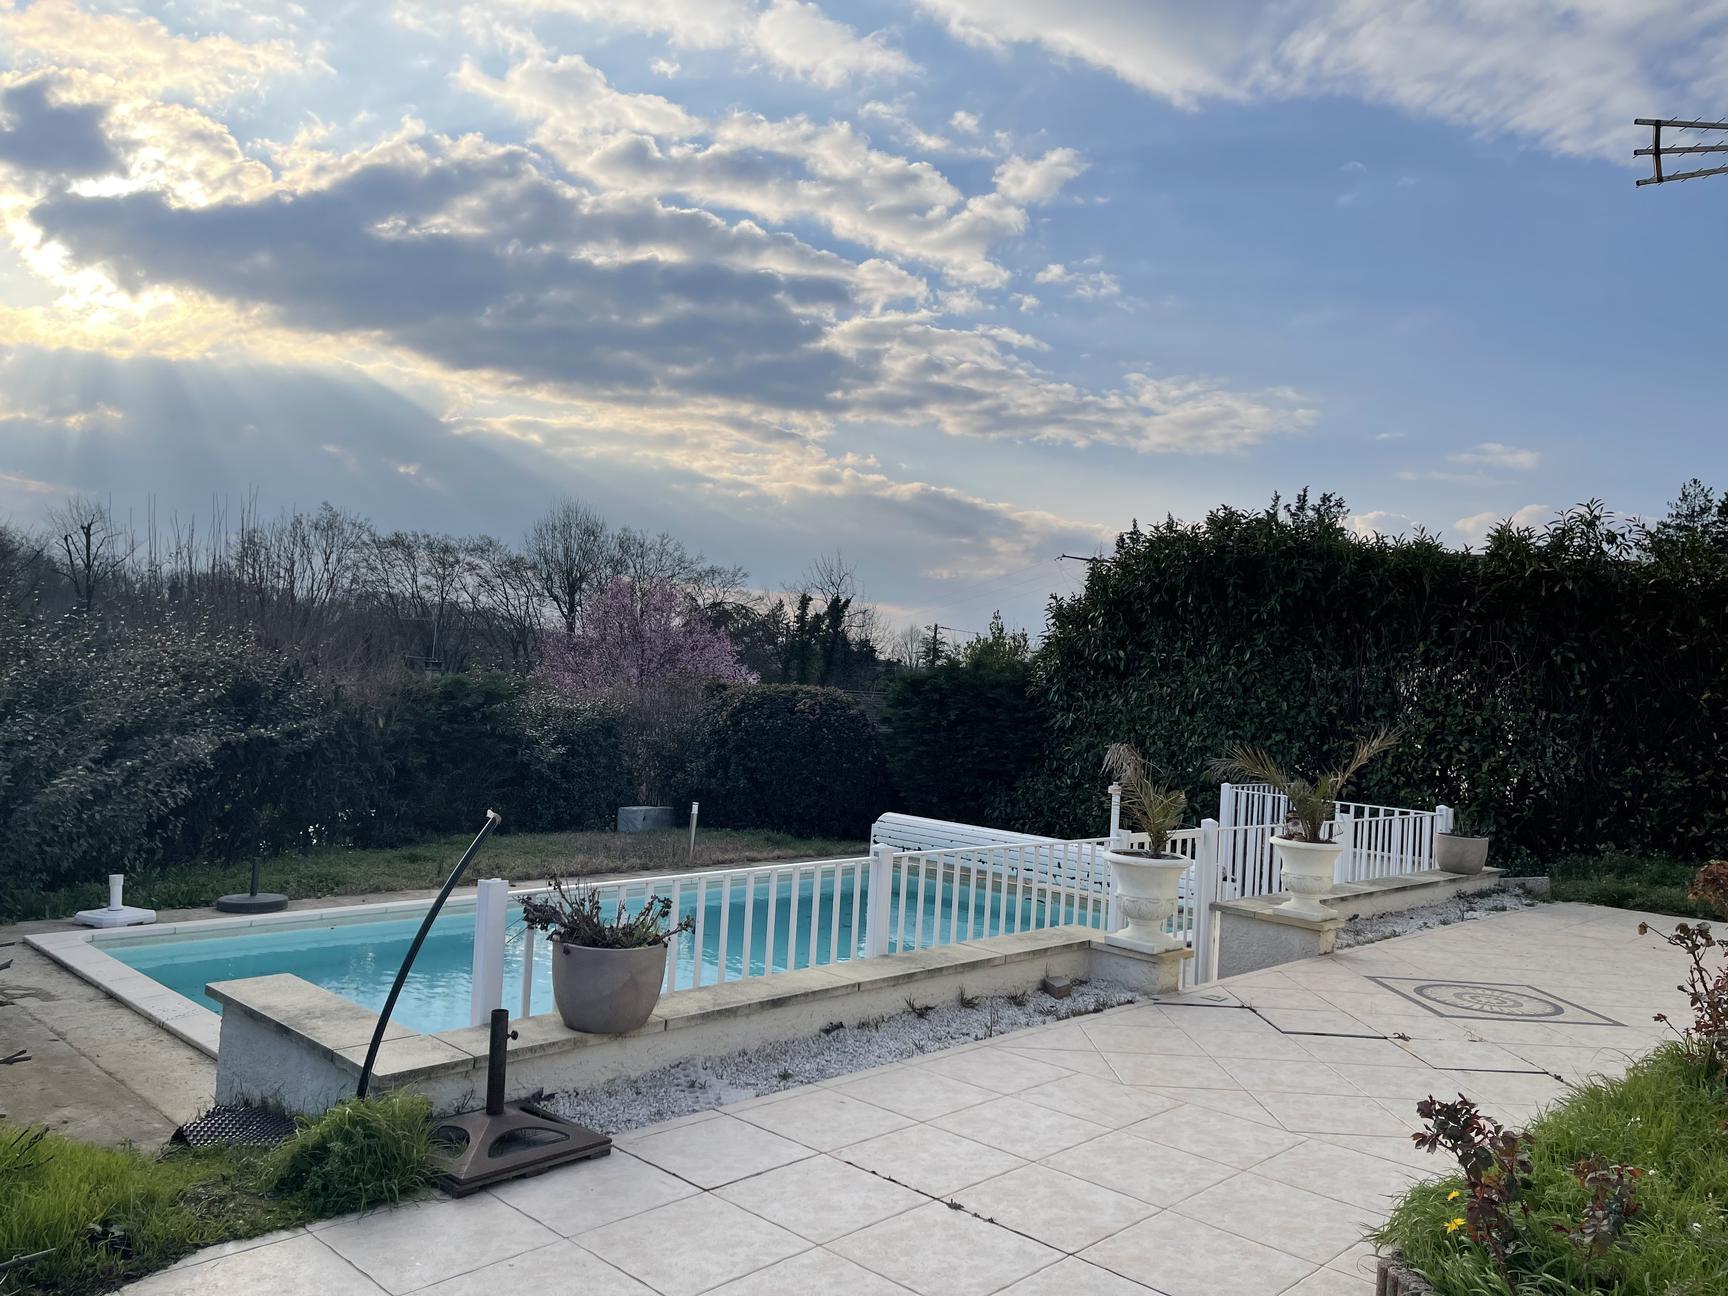 DOMMARTIN villa 150m2 4 chambres piscine